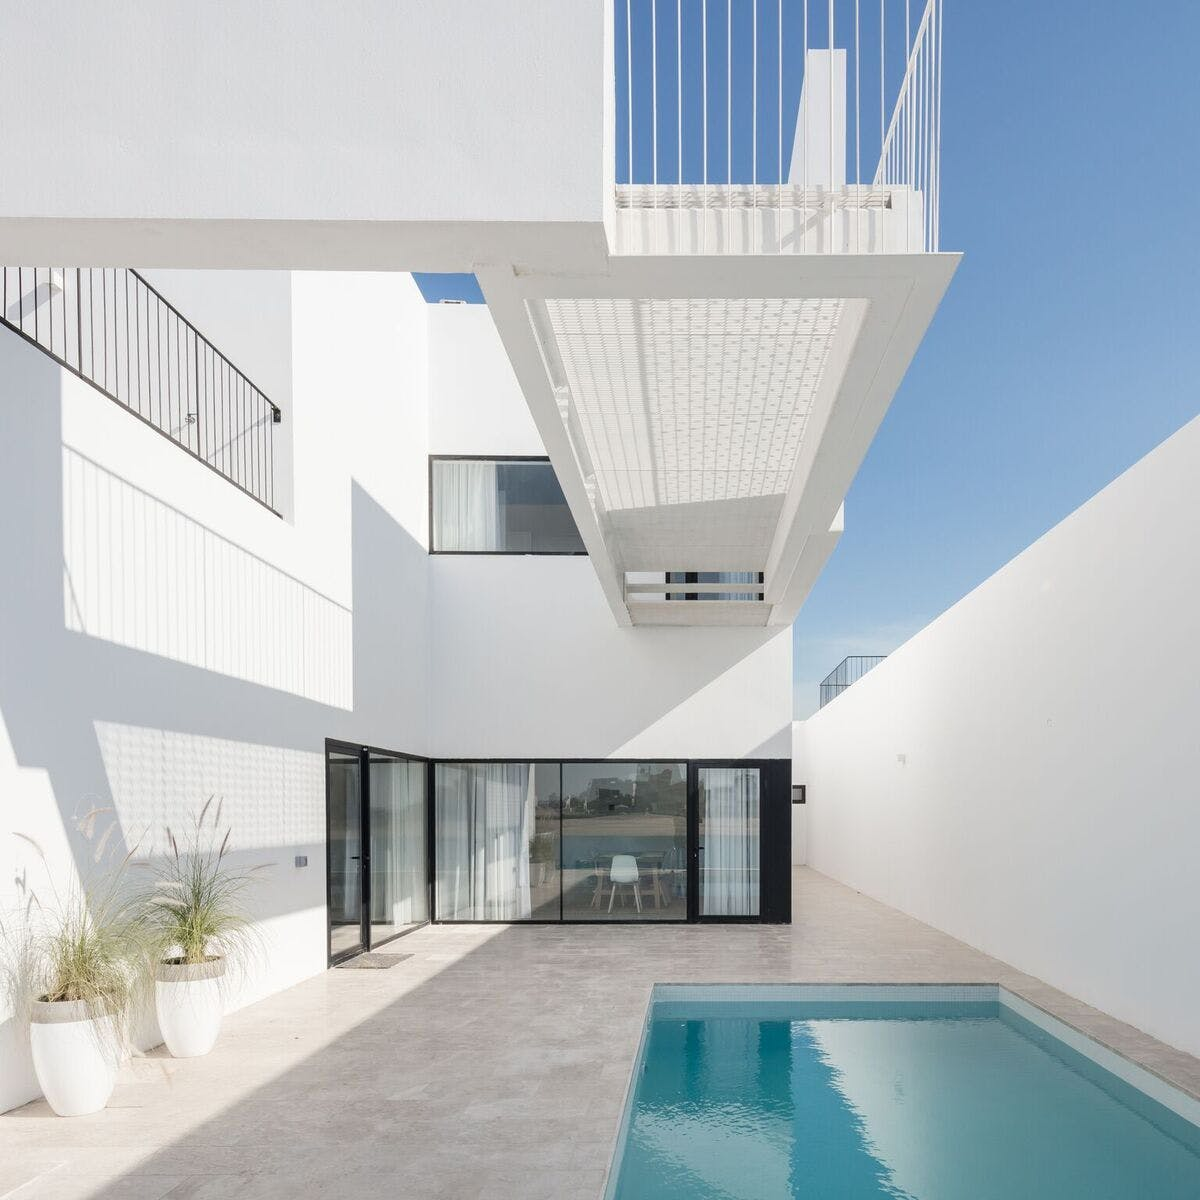 New Photos By Joao Morgado Capture Modern Kuwaiti Housing Project